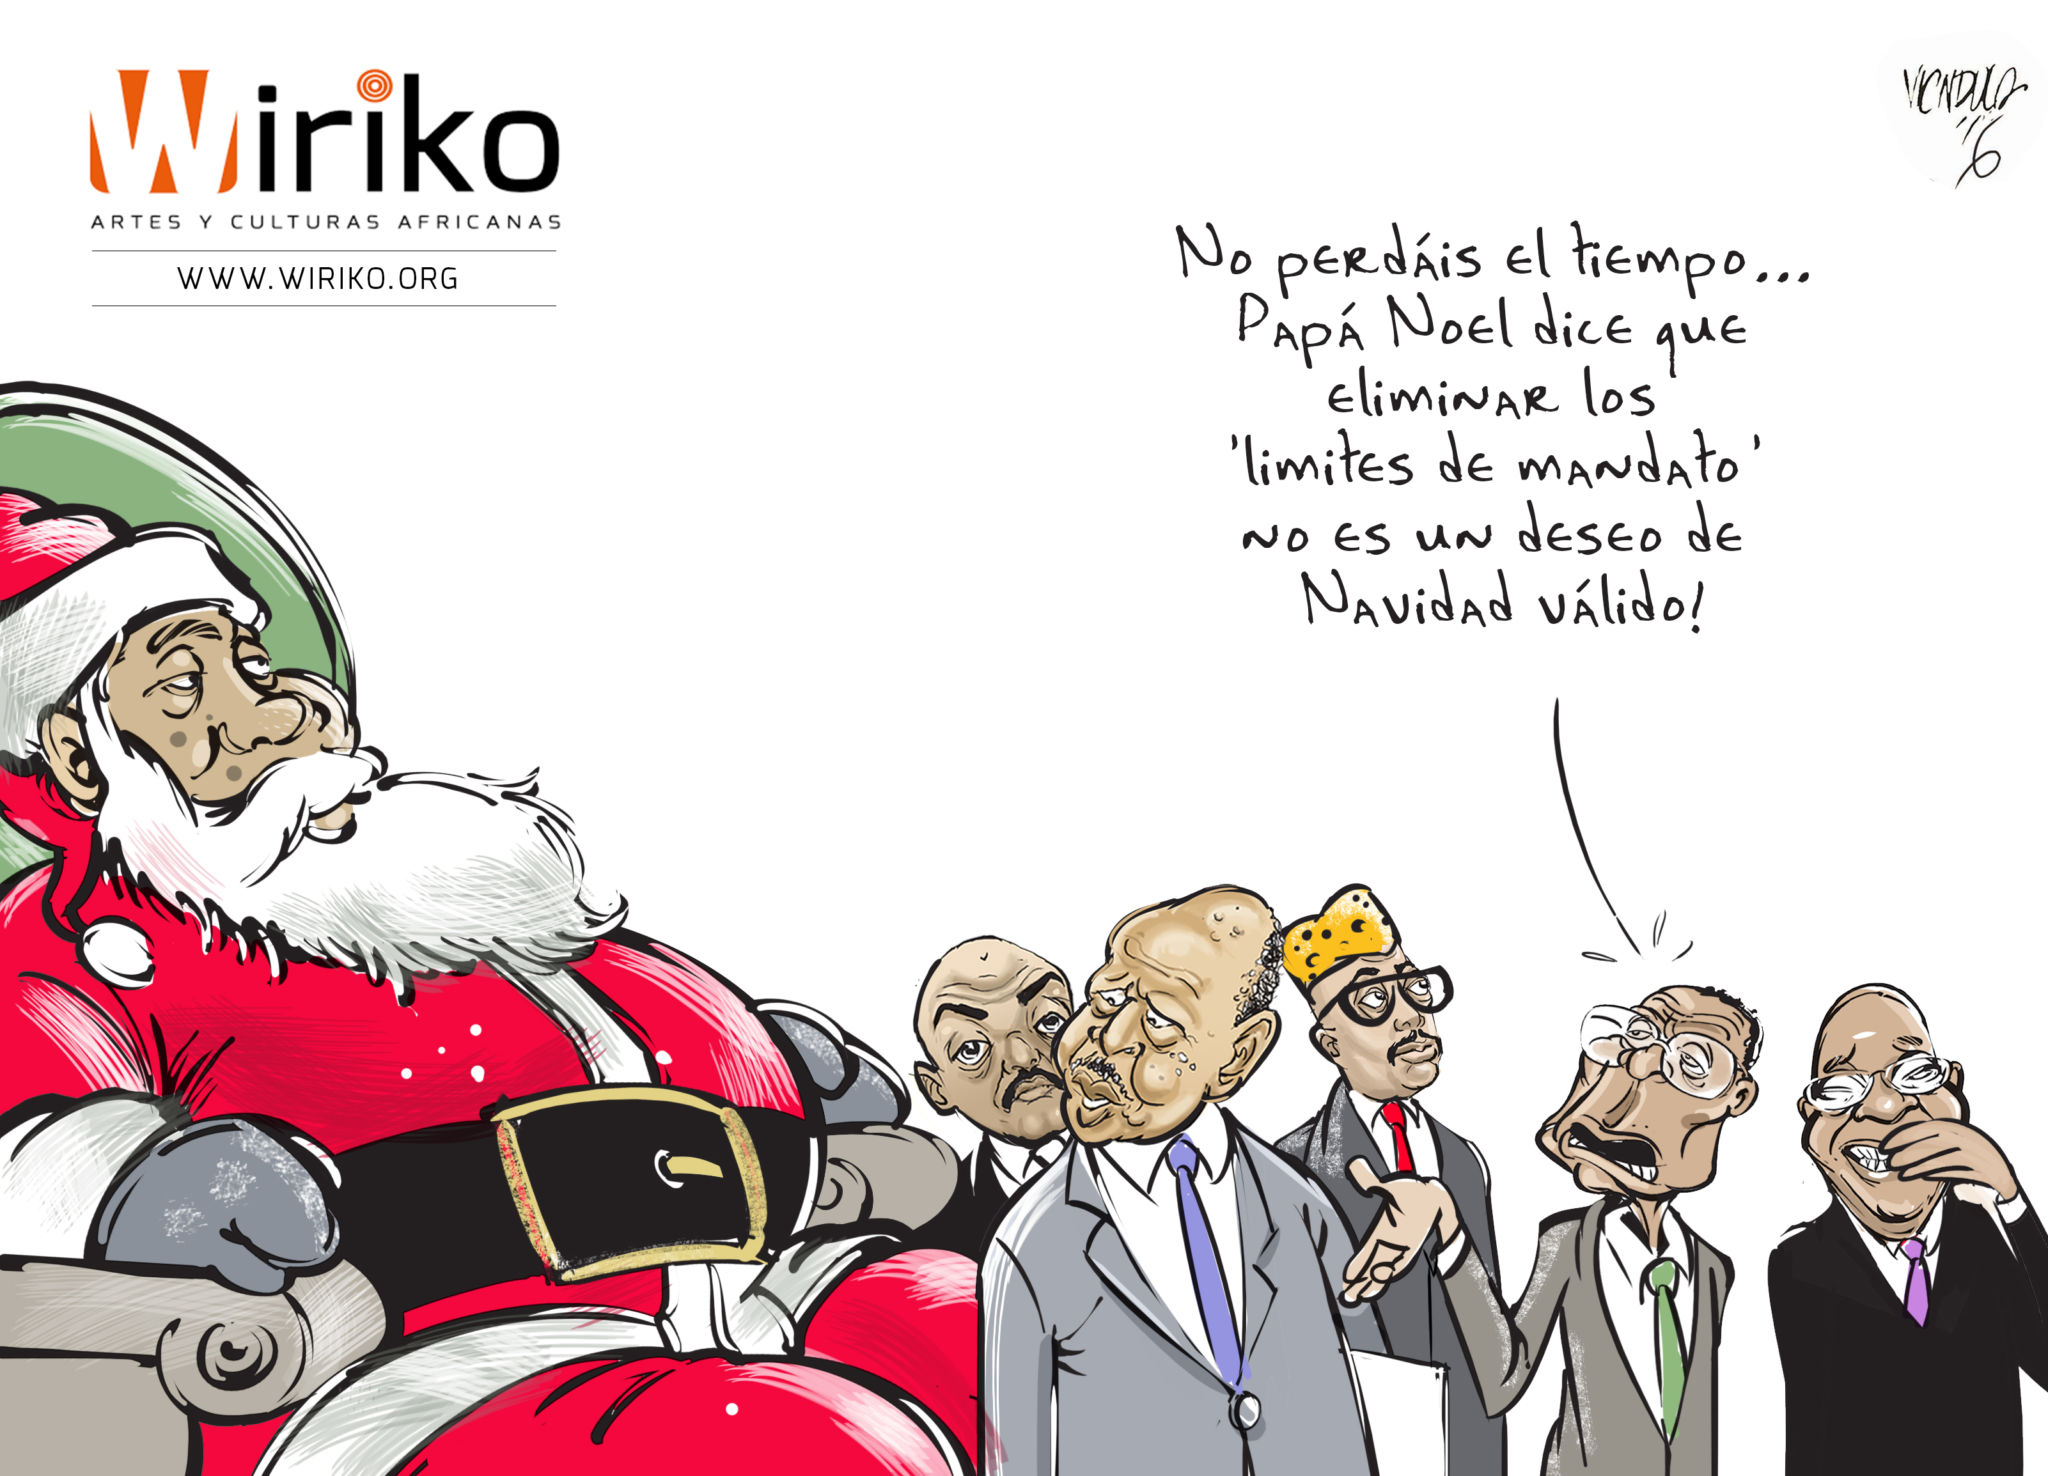 Wiriko Archives · Página 4 de 30 · Wiriko